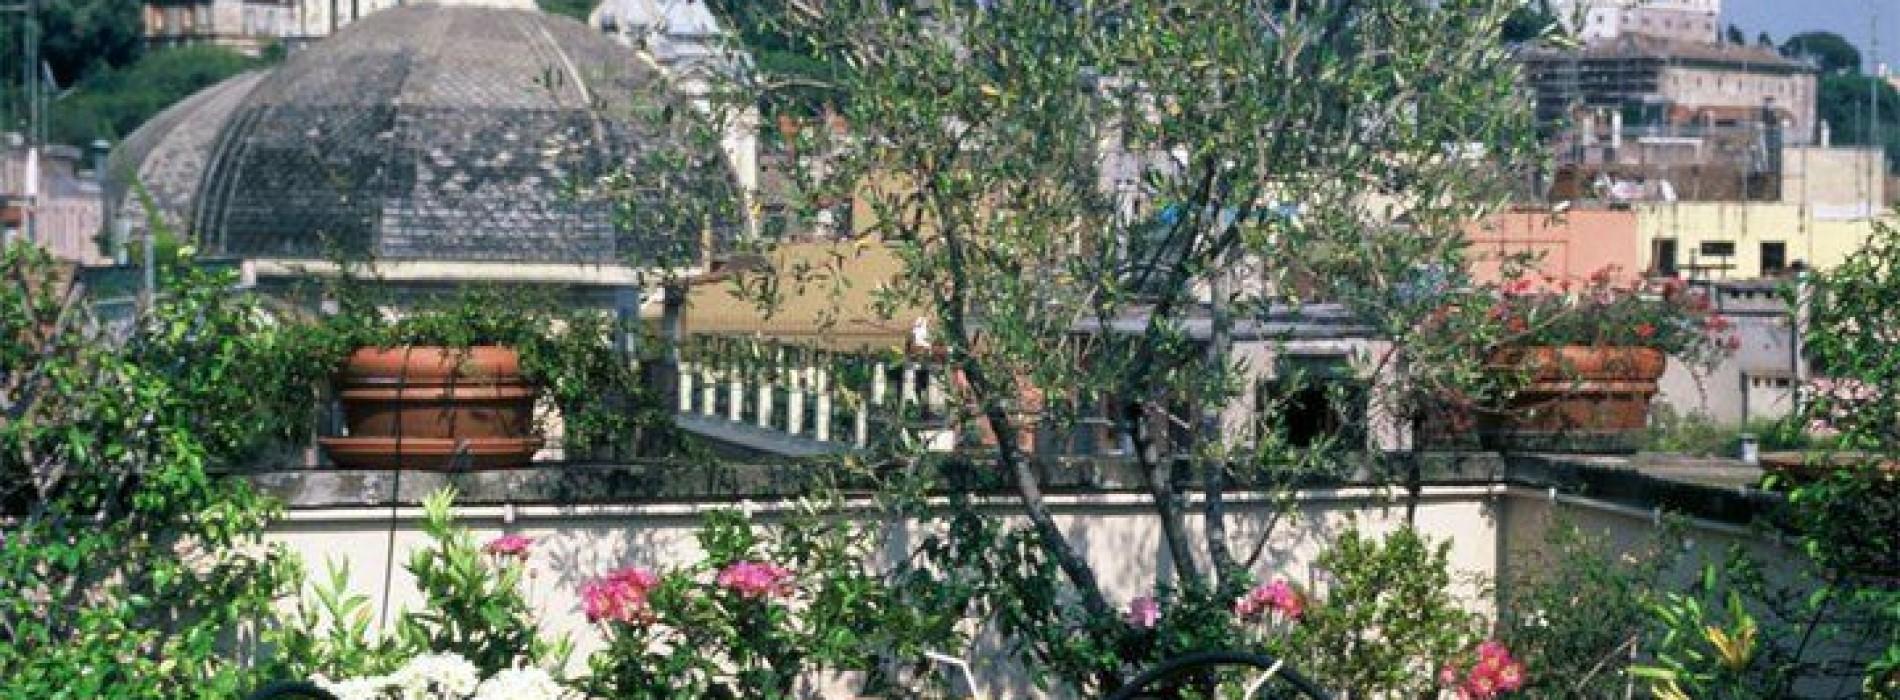 Brunch a Roma: terrazze, giardini e dehors